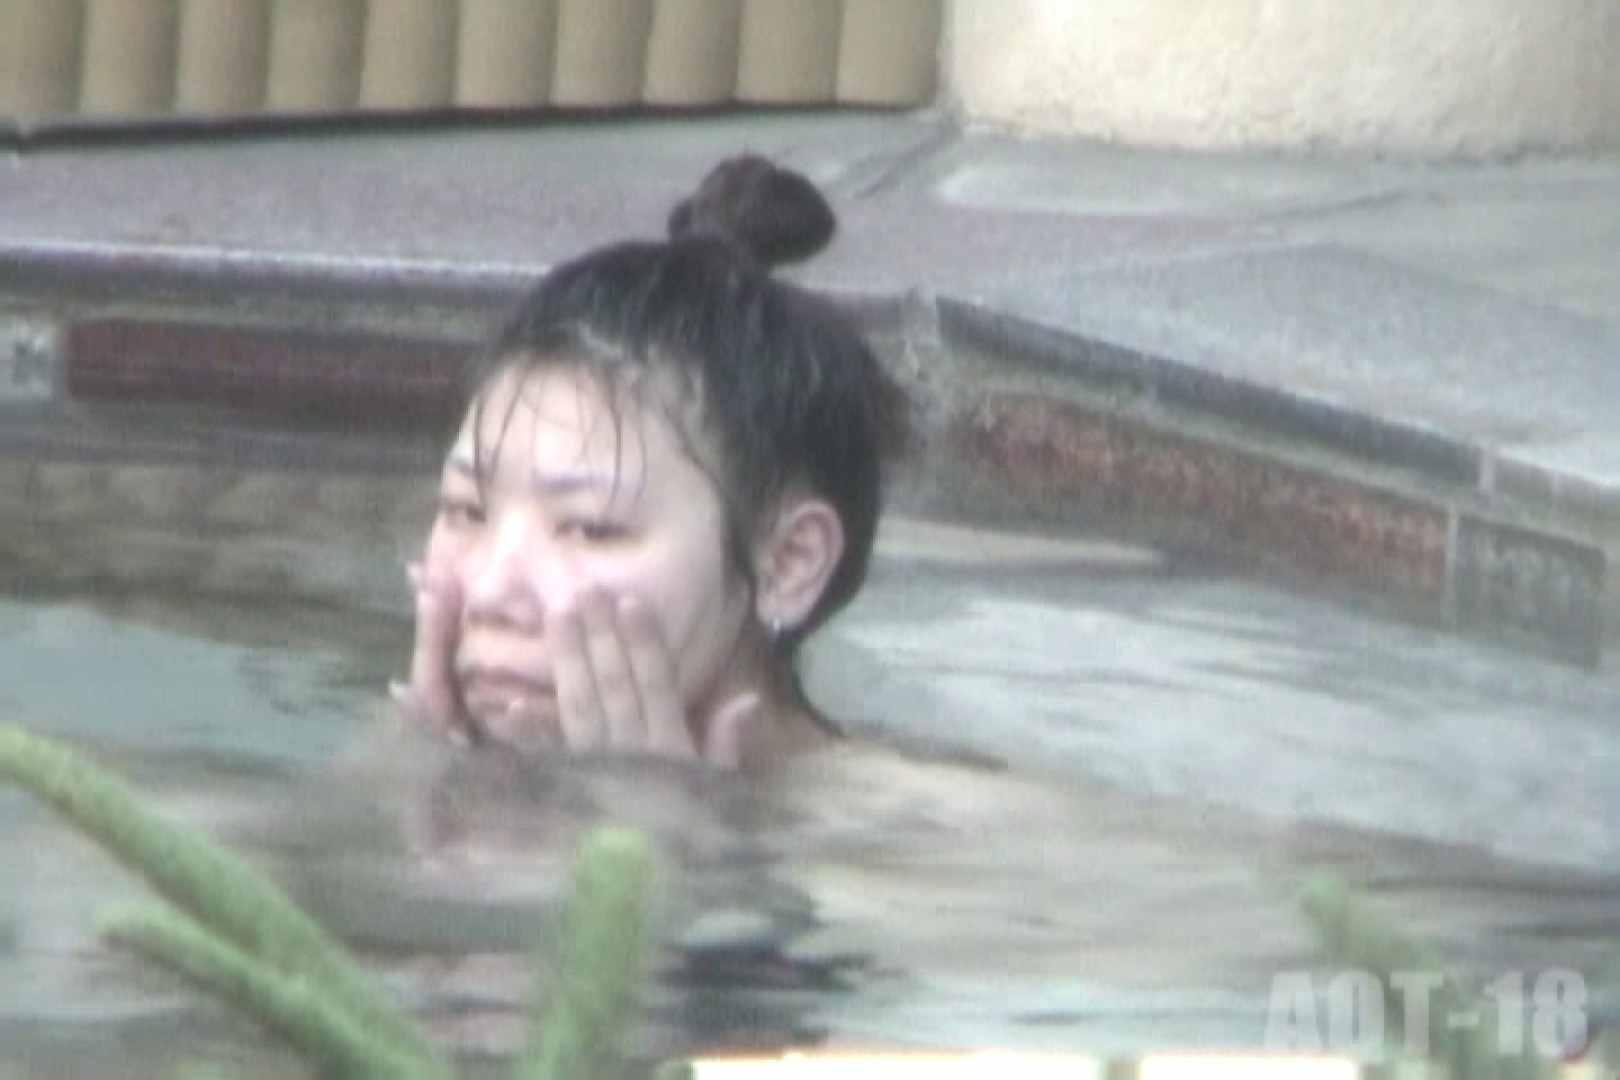 Aquaな露天風呂Vol.855 露天風呂編 | 盗撮シリーズ  86PIX 33